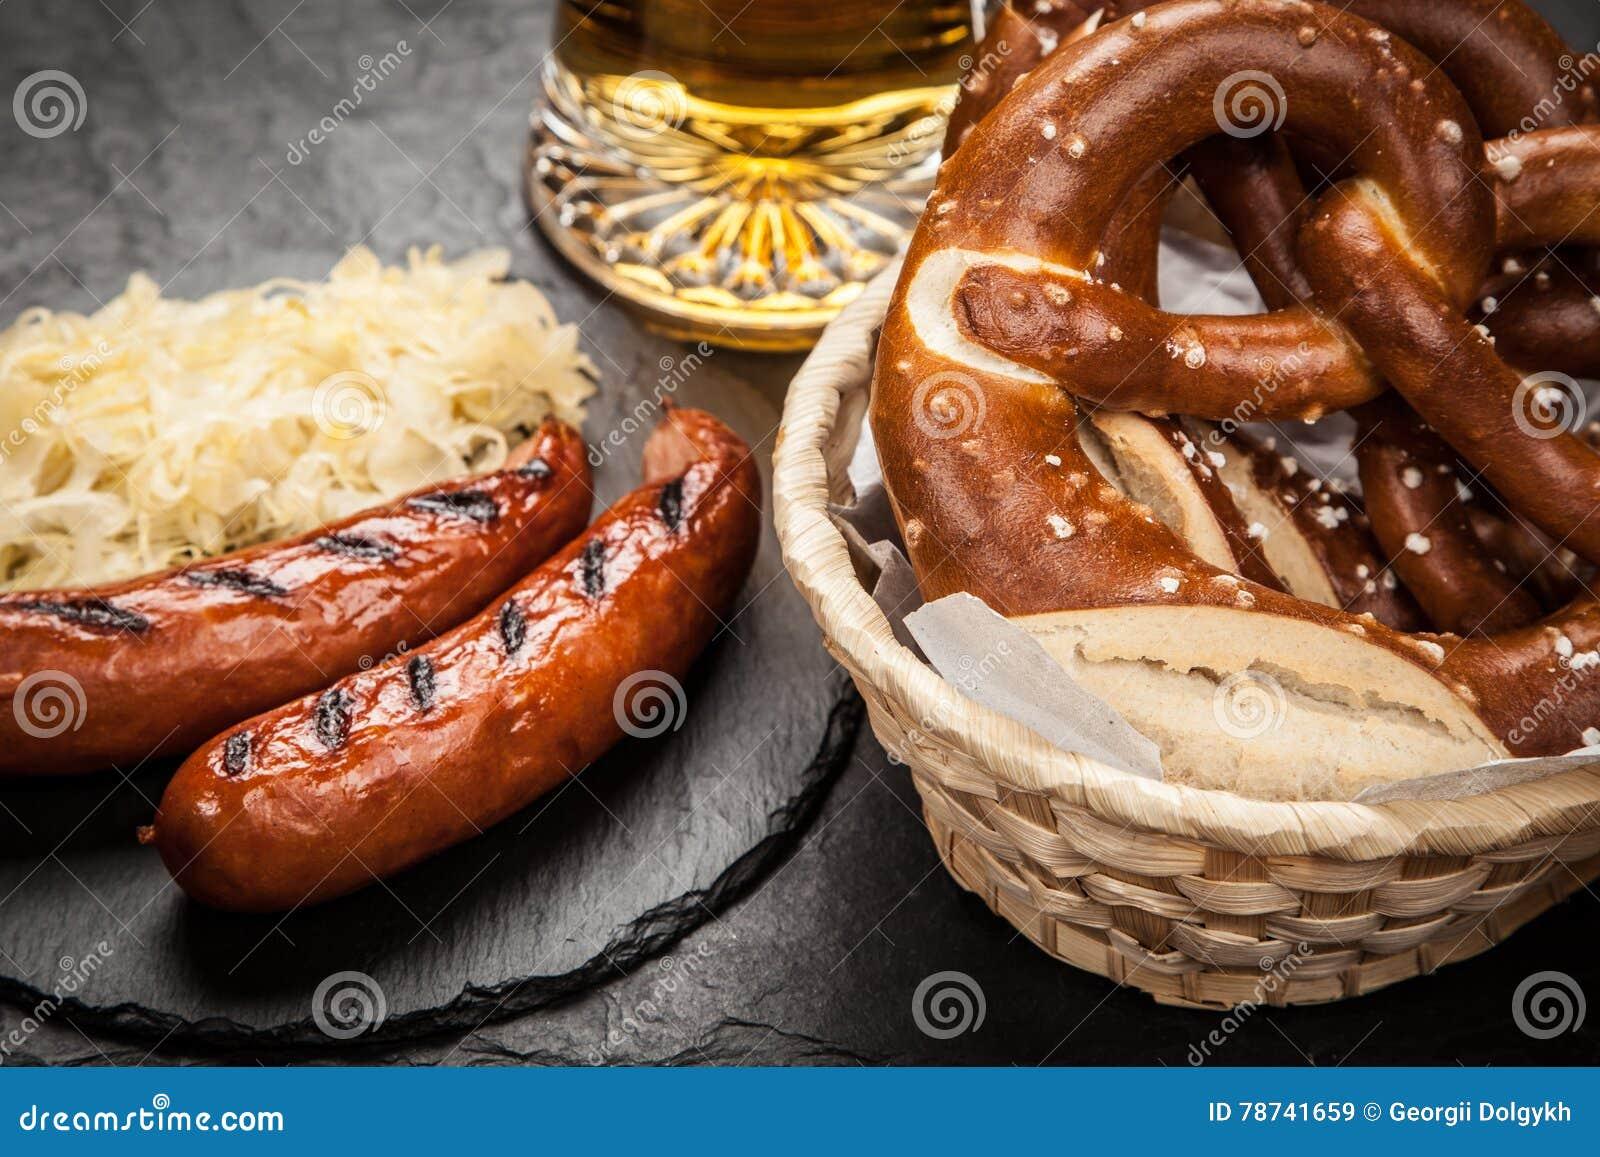 how to cook bavarian bratwurst